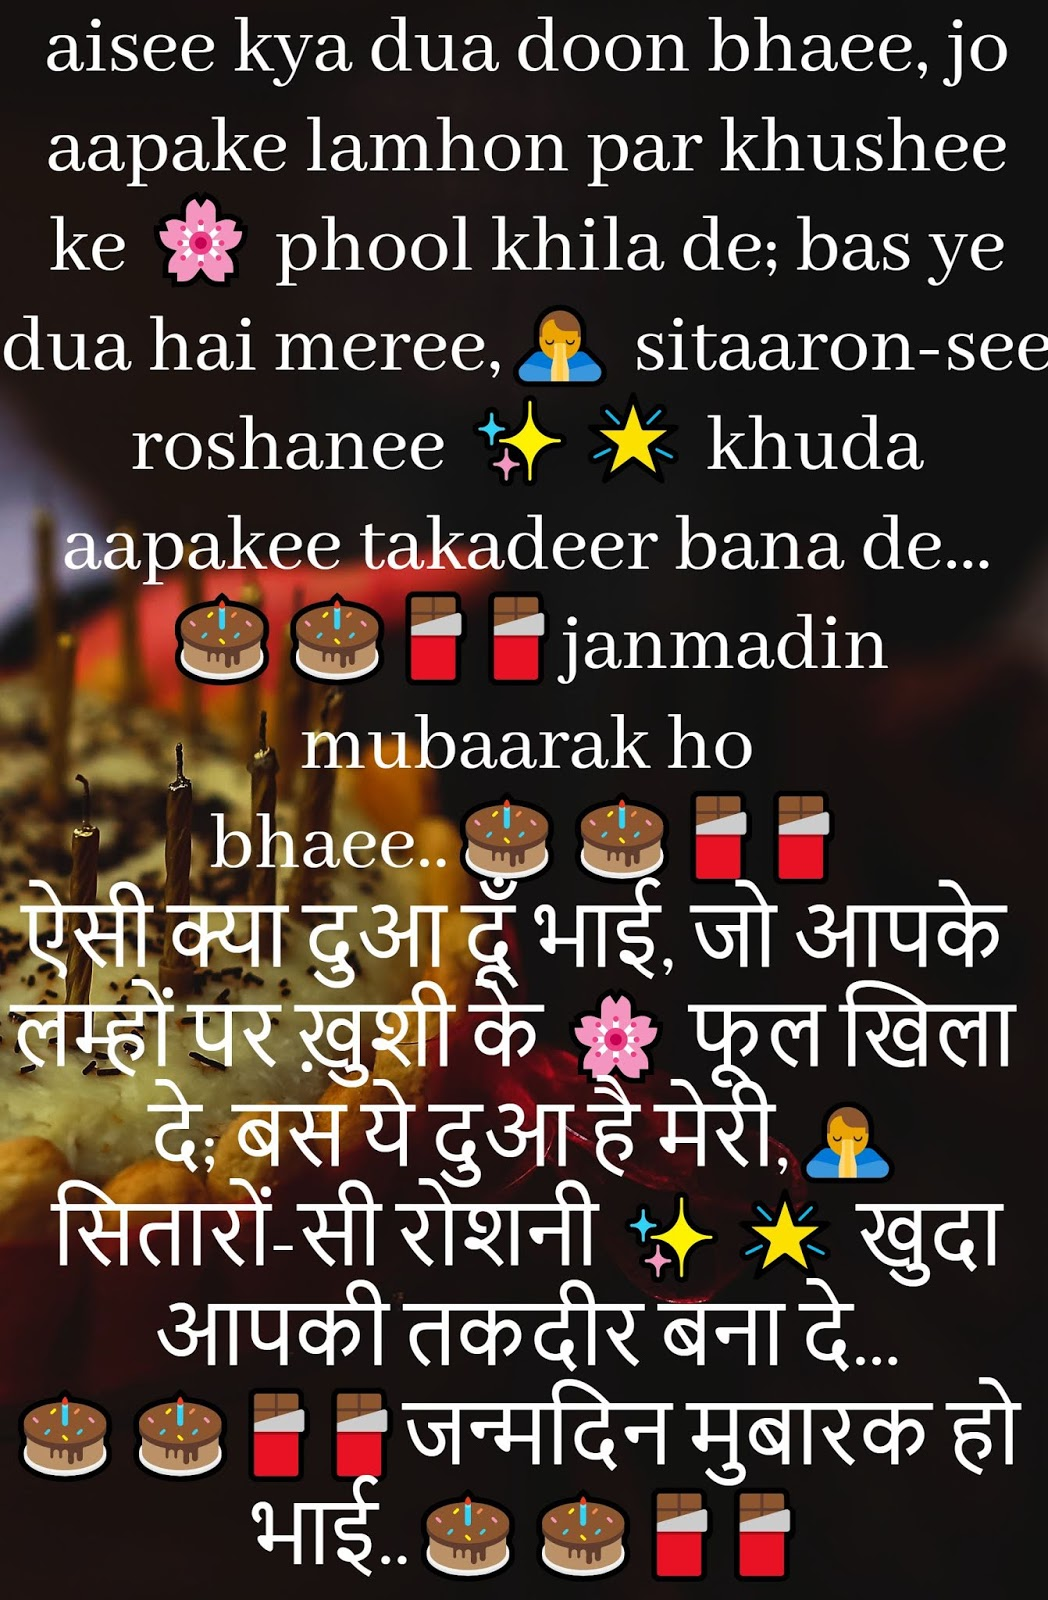 Top 10 Birthday Wishes For Brother In Hindi Birthday Shayari For Brother Latest Collection Birthday Shayari